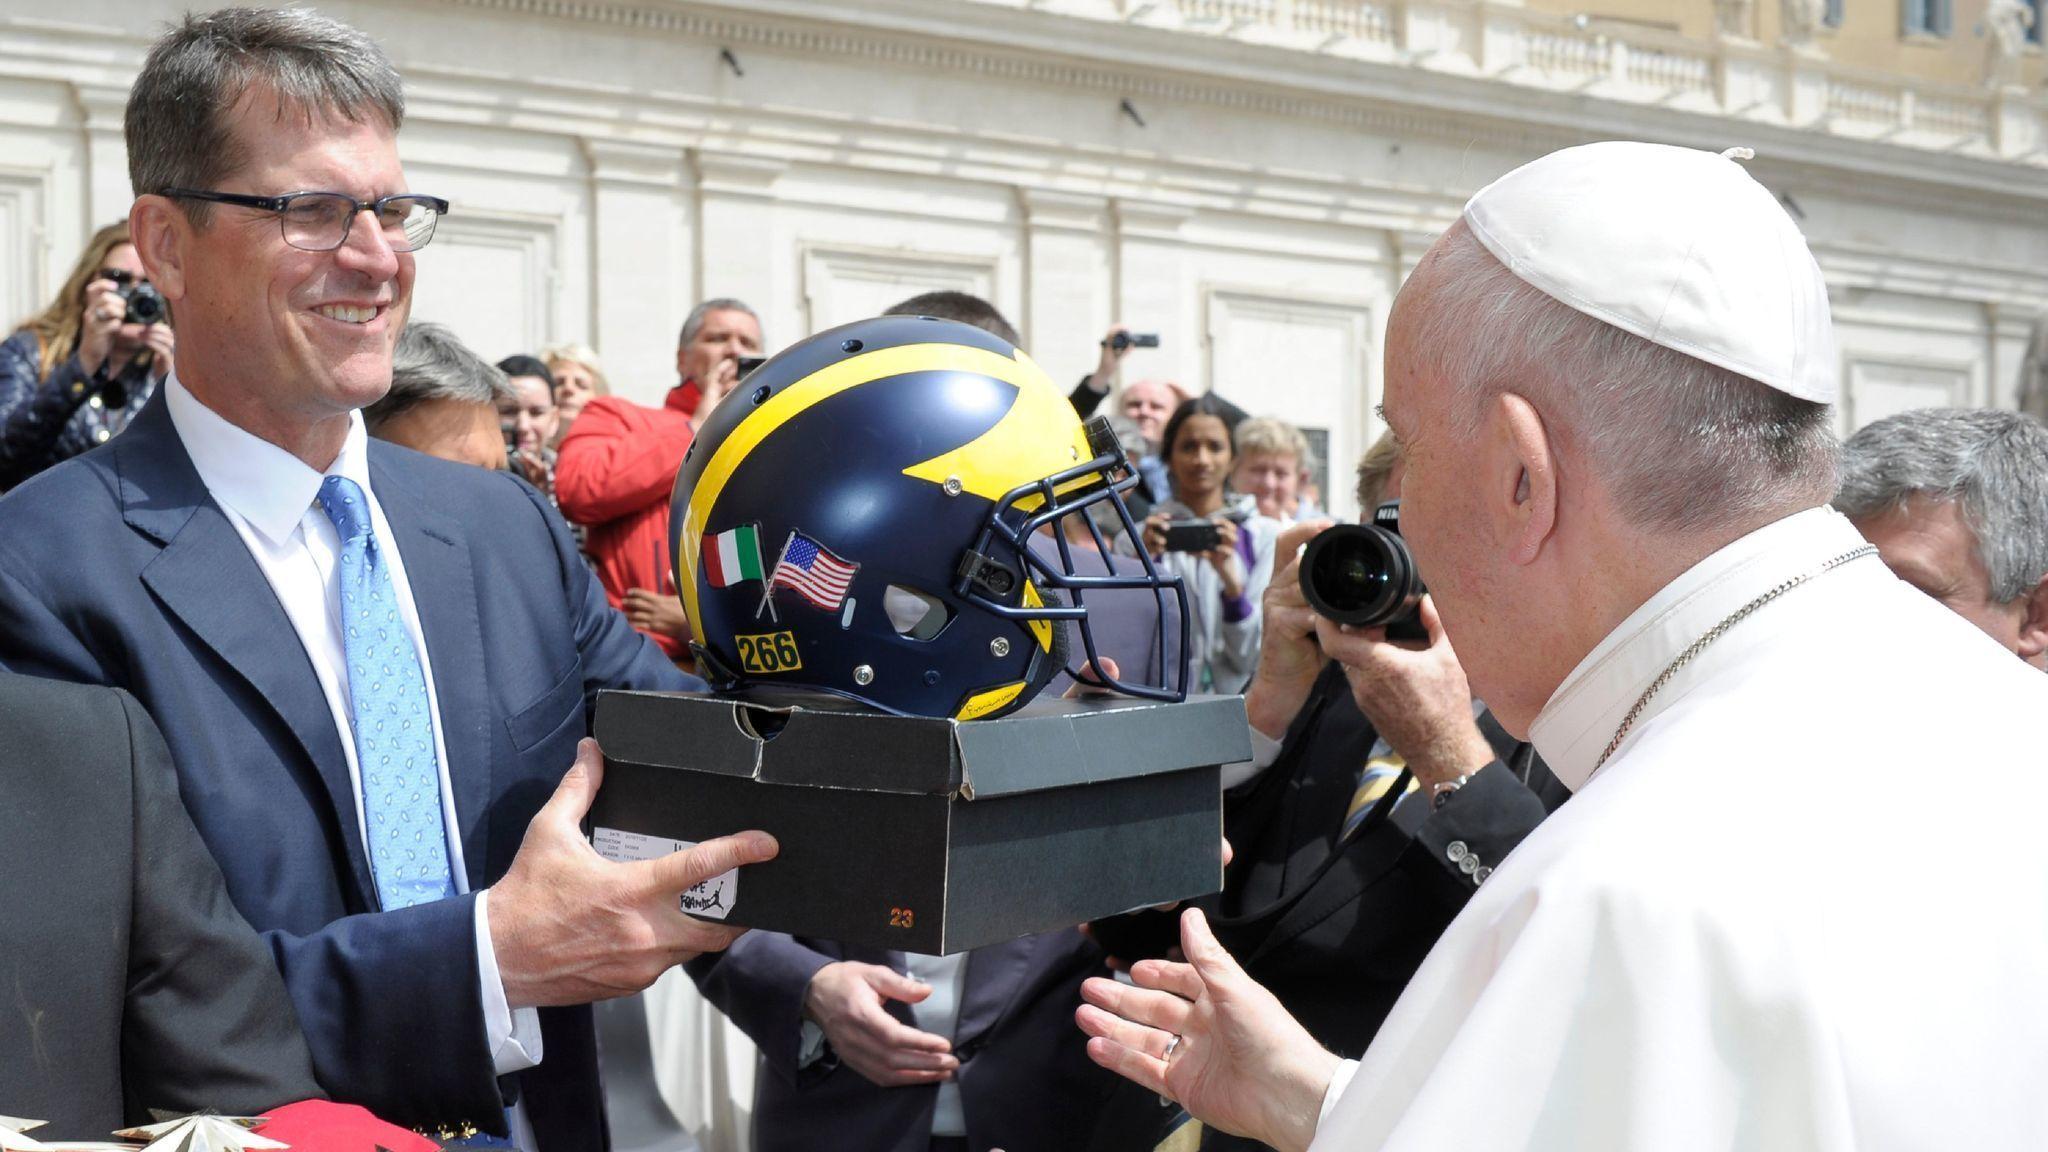 Ct-jim-harbaugh-pope-francis-20170426